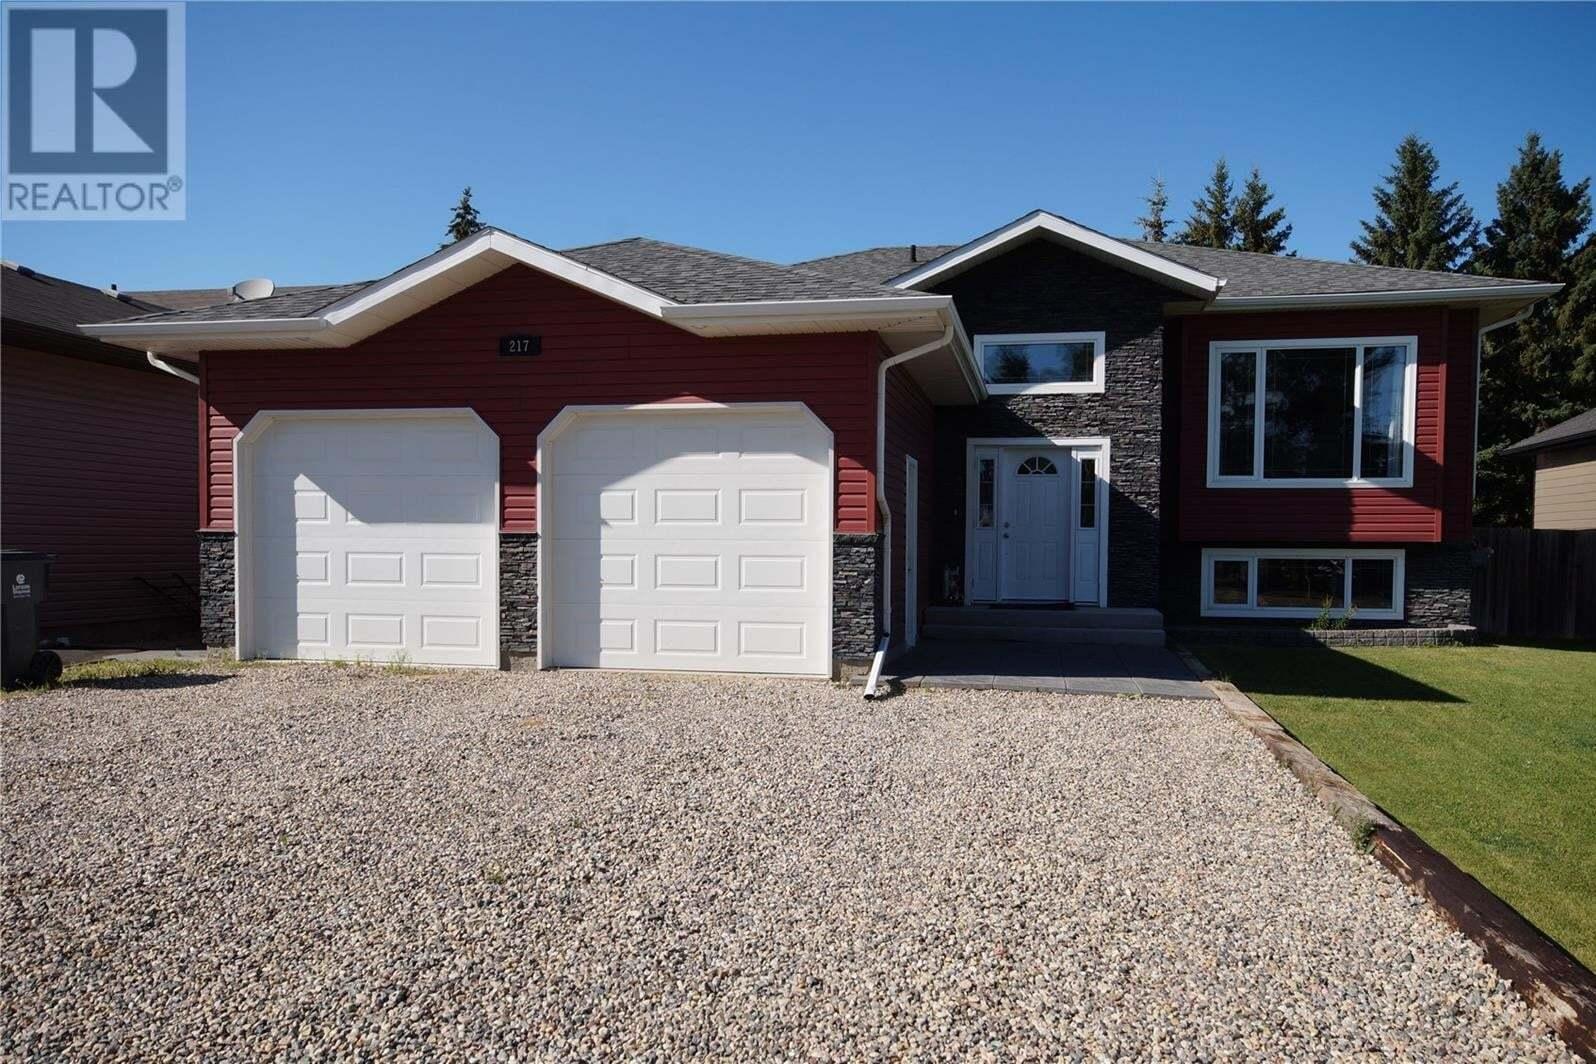 House for sale at 217 2nd St S Waldheim Saskatchewan - MLS: SK817204